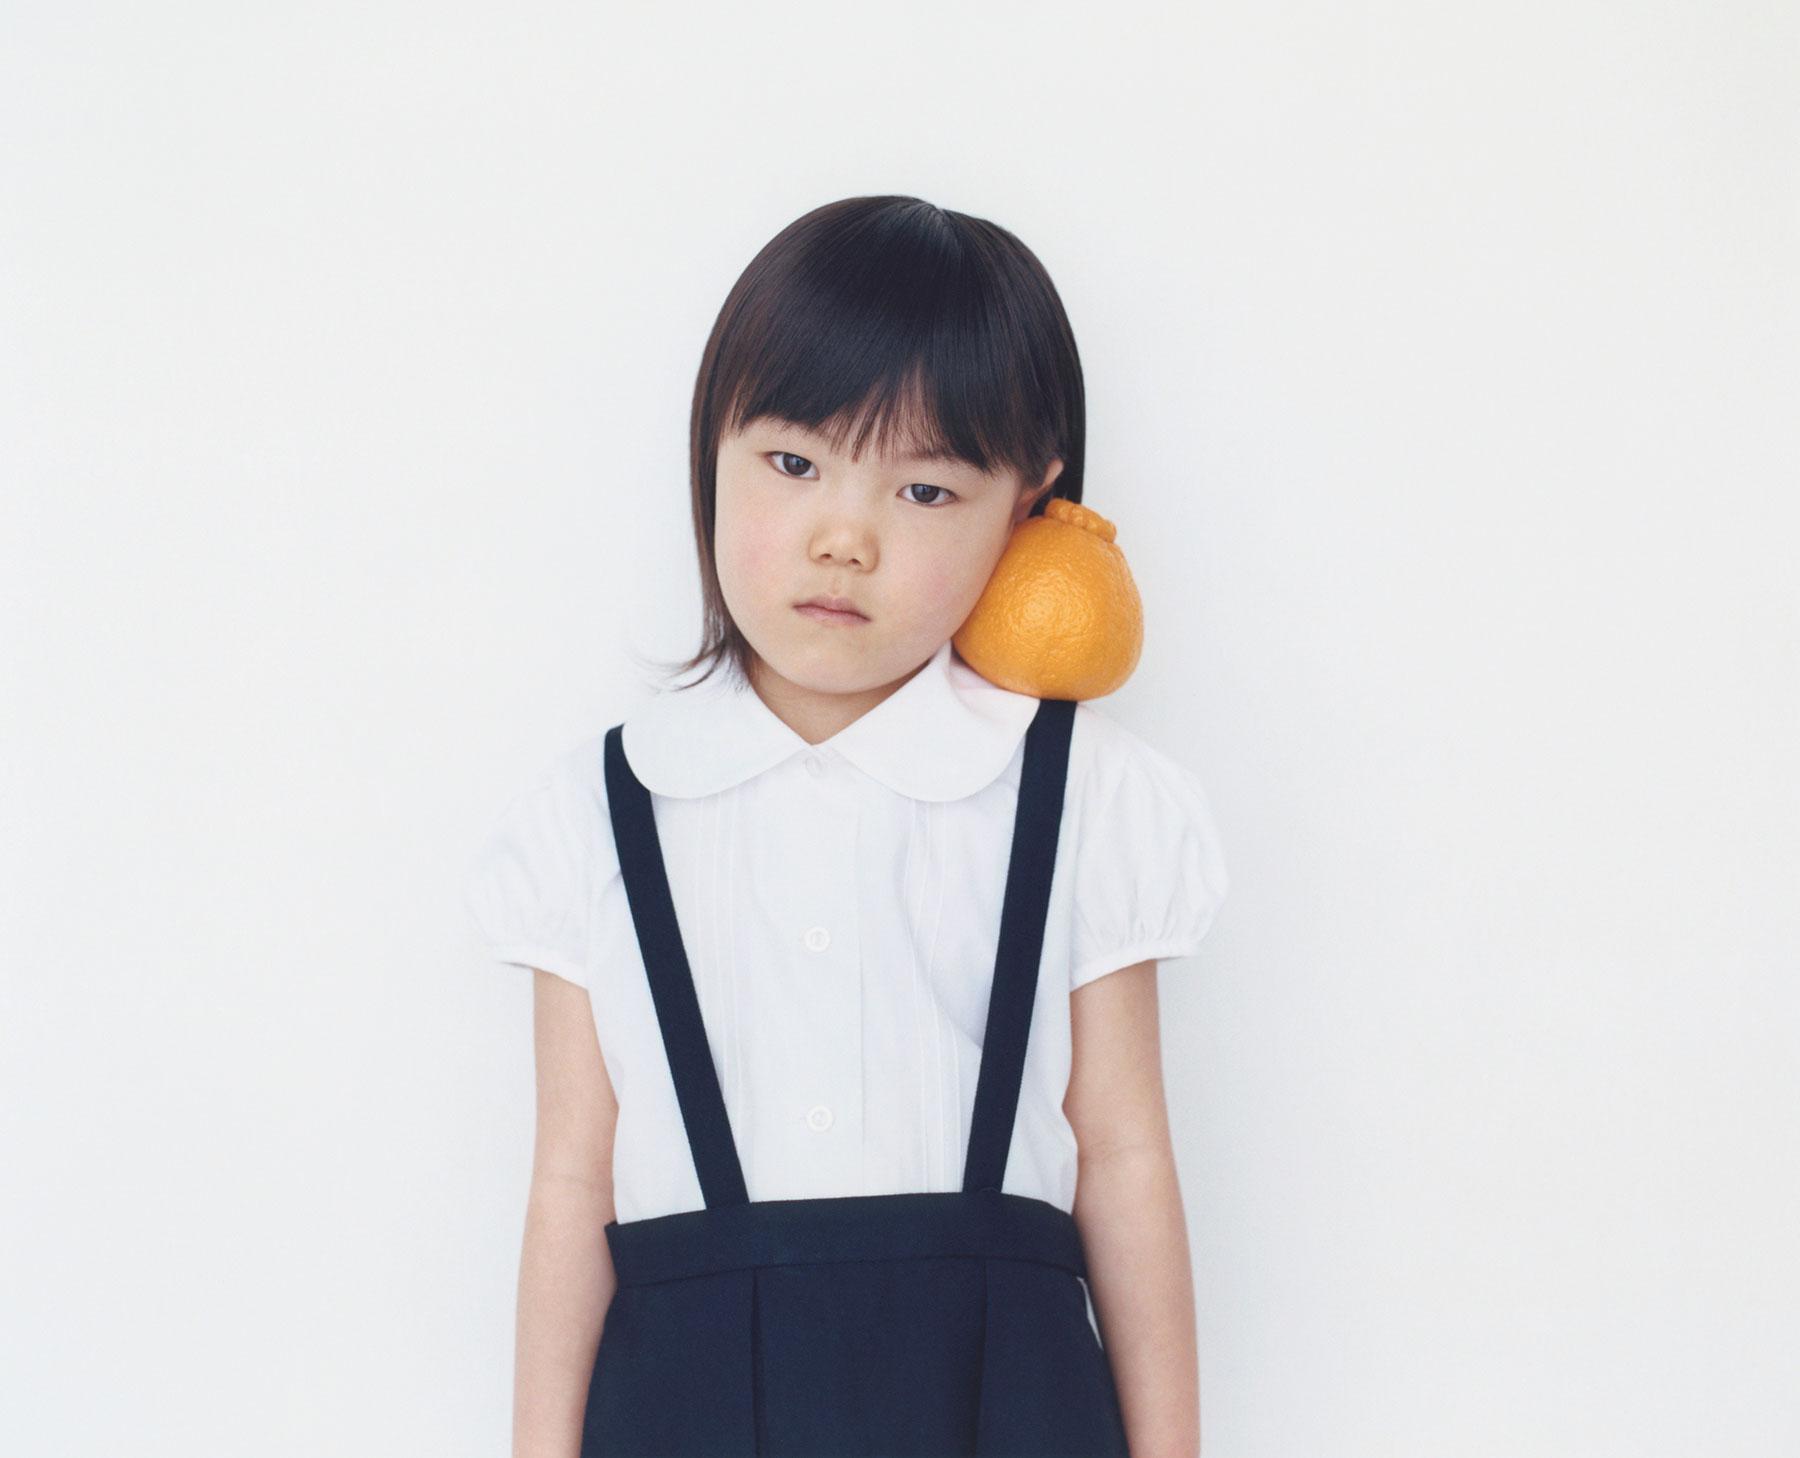 Osamu Yokonami,  1000 Children: Sumo Mandarin No. 75 , 2010-2013  Digital pigment print, 895 x 1105 mm (approx. 34.25 x 43.5 in), edition of 5; 146 x 168 mm (approx. 5.75 x 6.6 in), edition of 10   Inquire